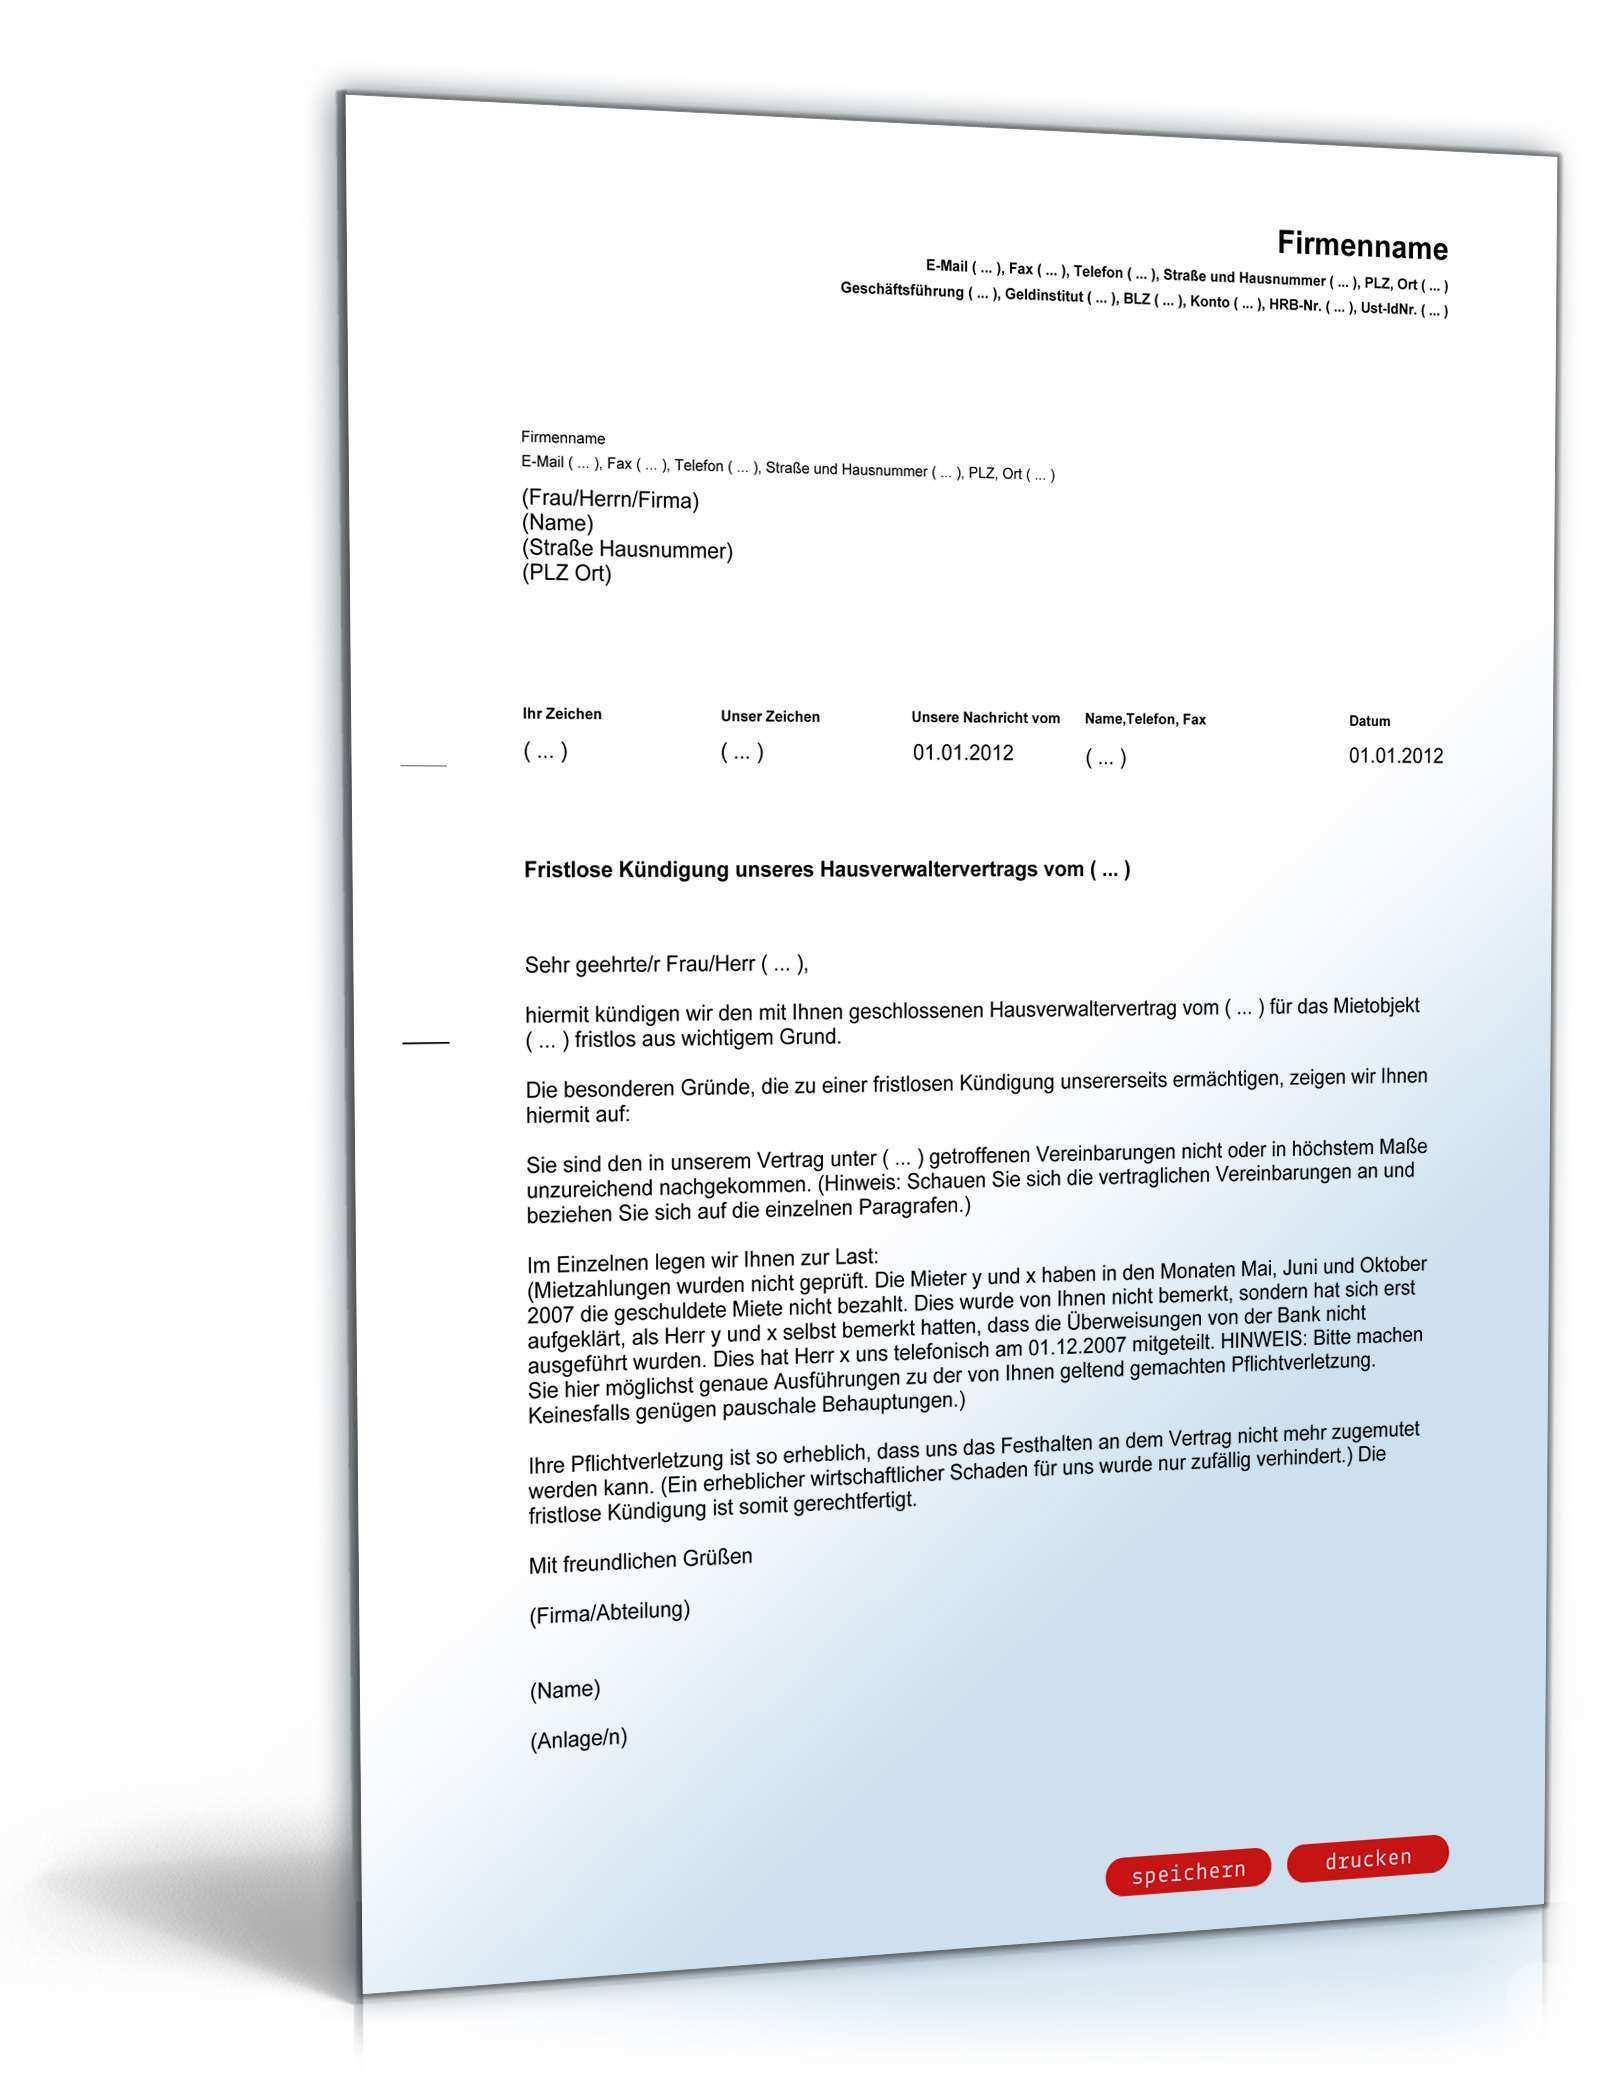 Fristlose Kundigung Hausverwaltervertrag Muster Zum Download